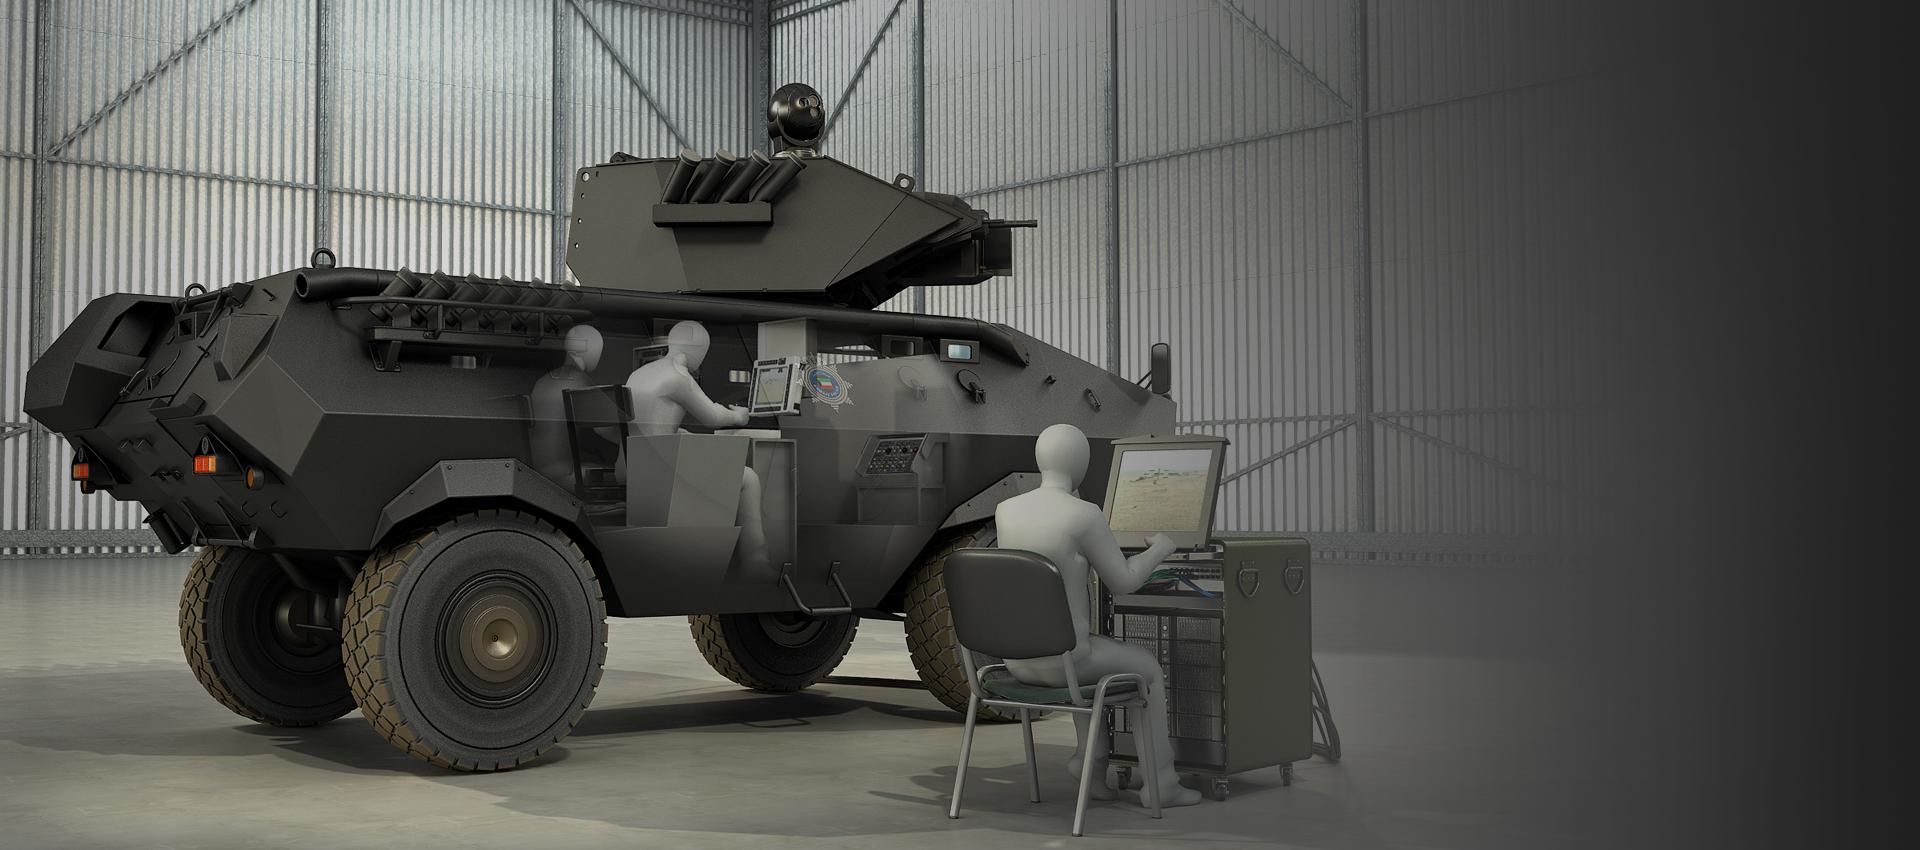 Condor Vehicle